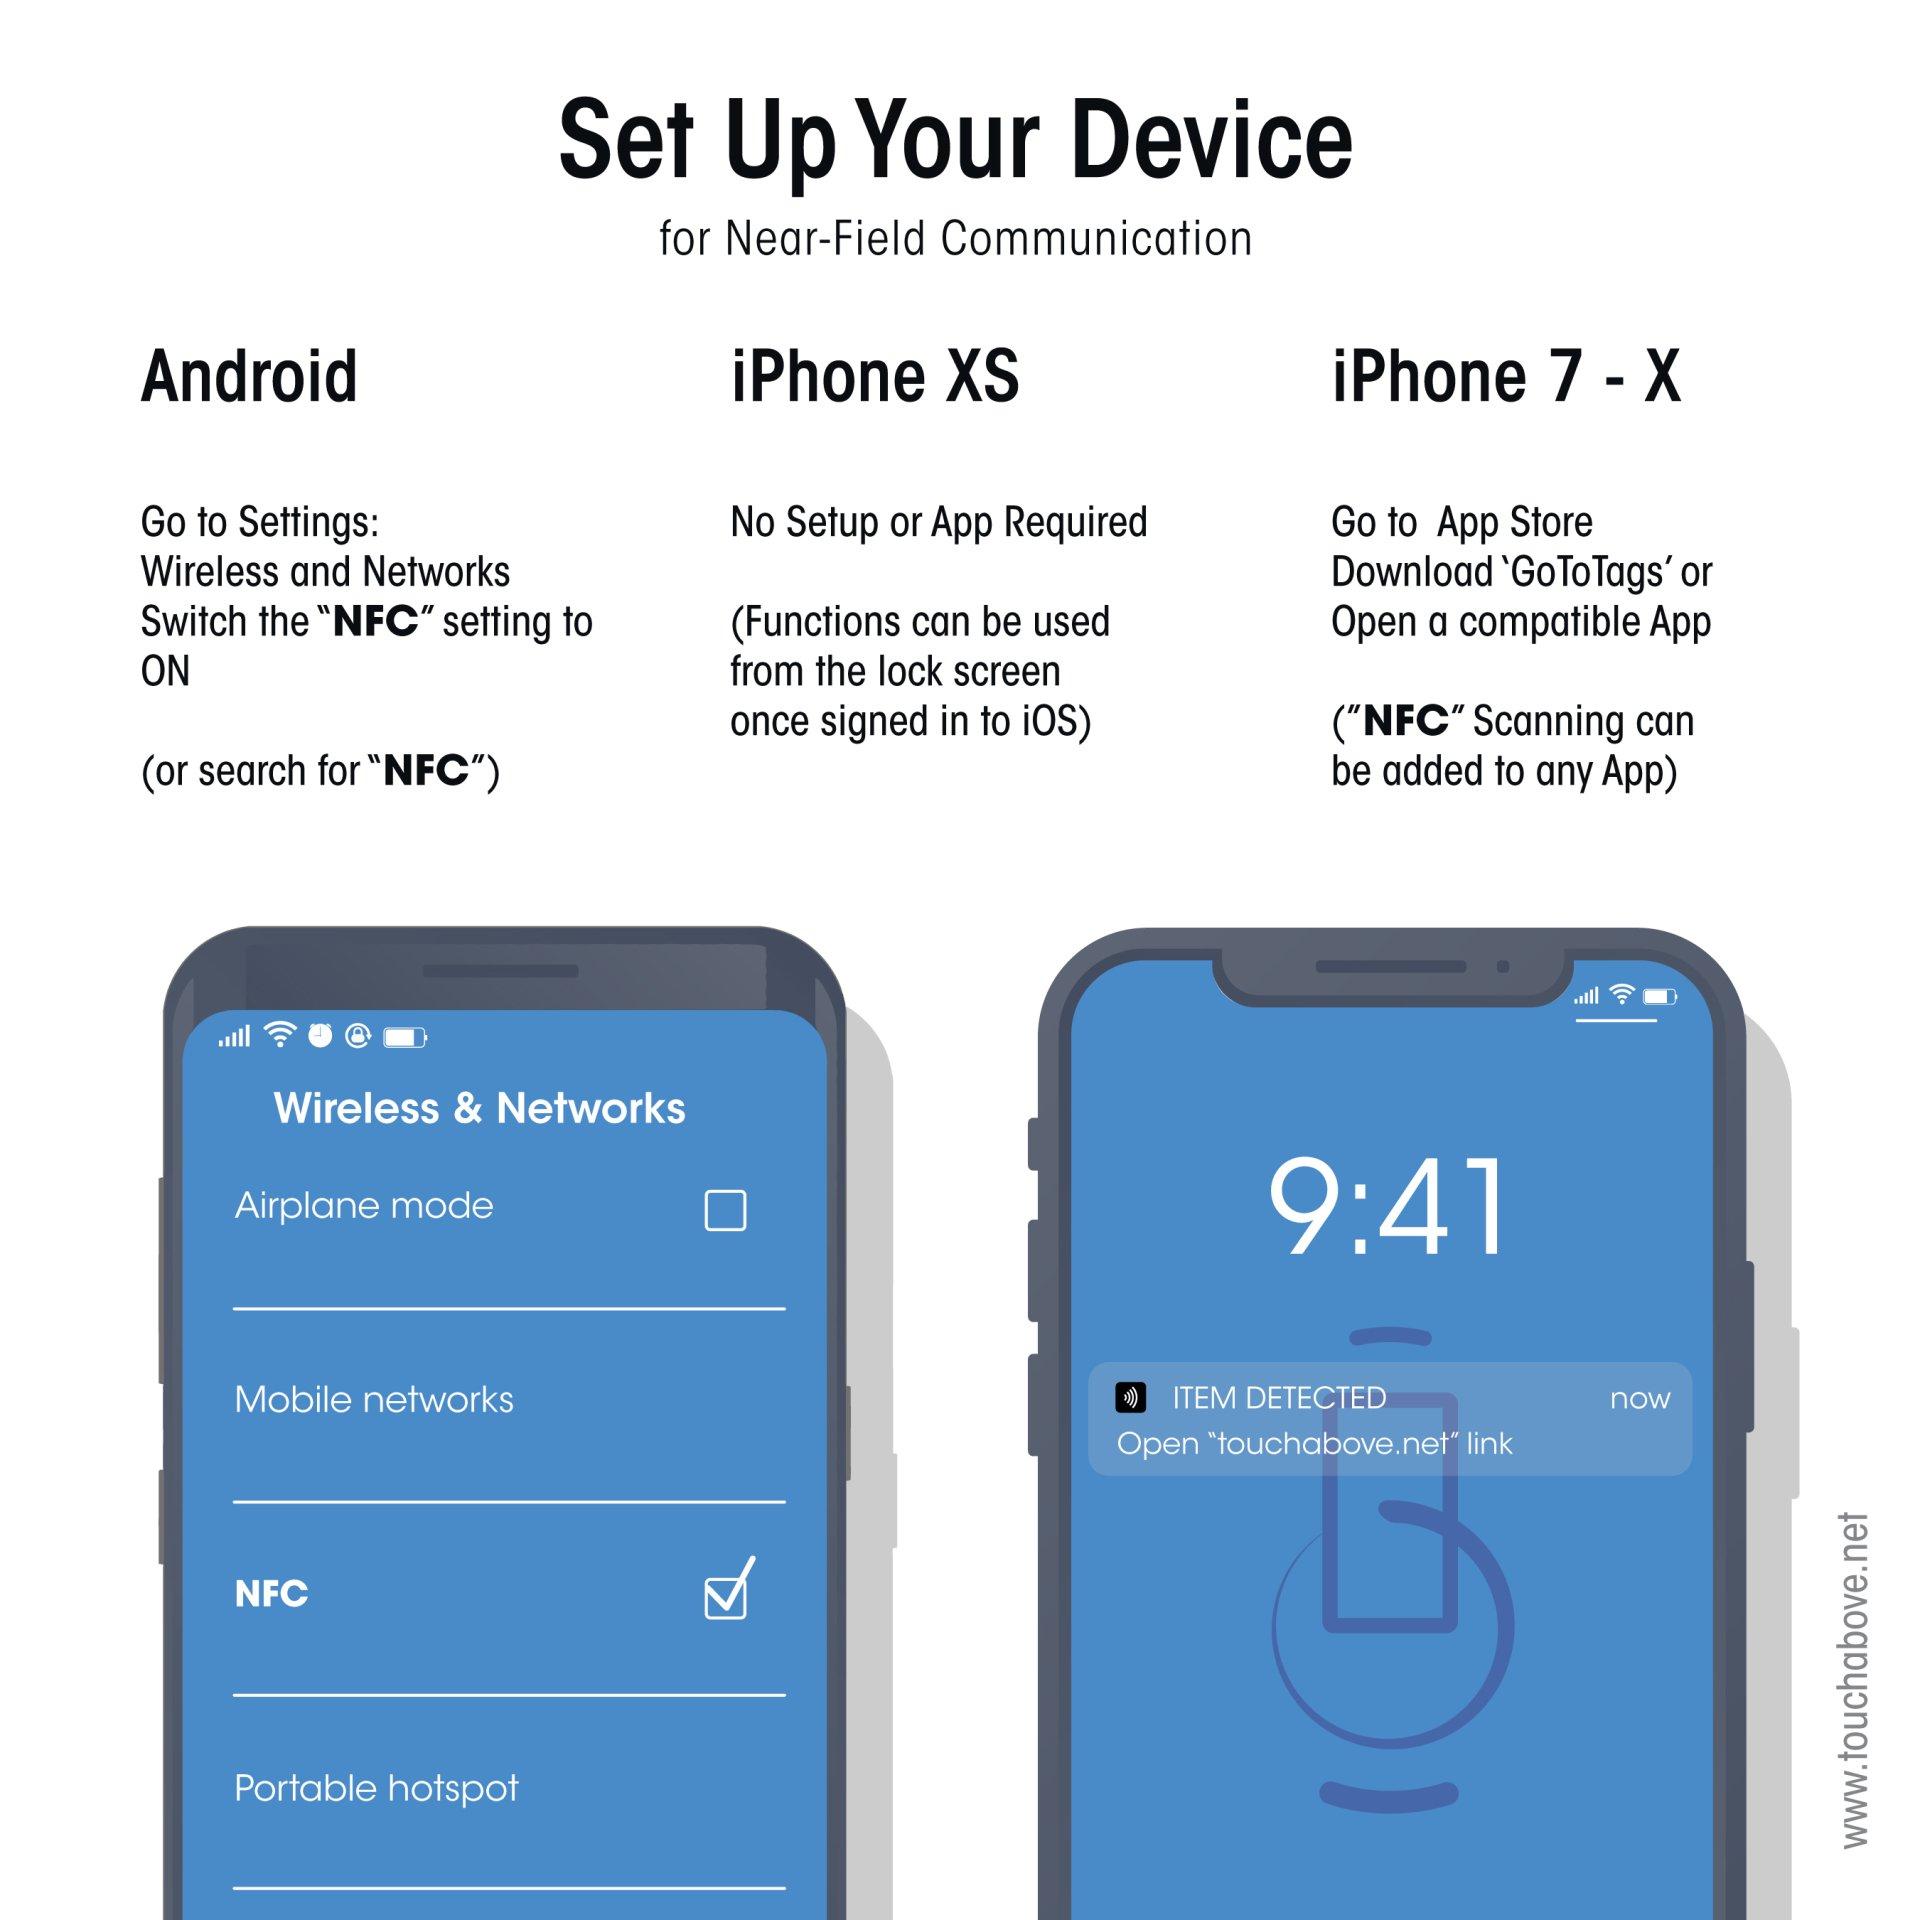 Apple Releases NFC (near-field communication) Capabilities